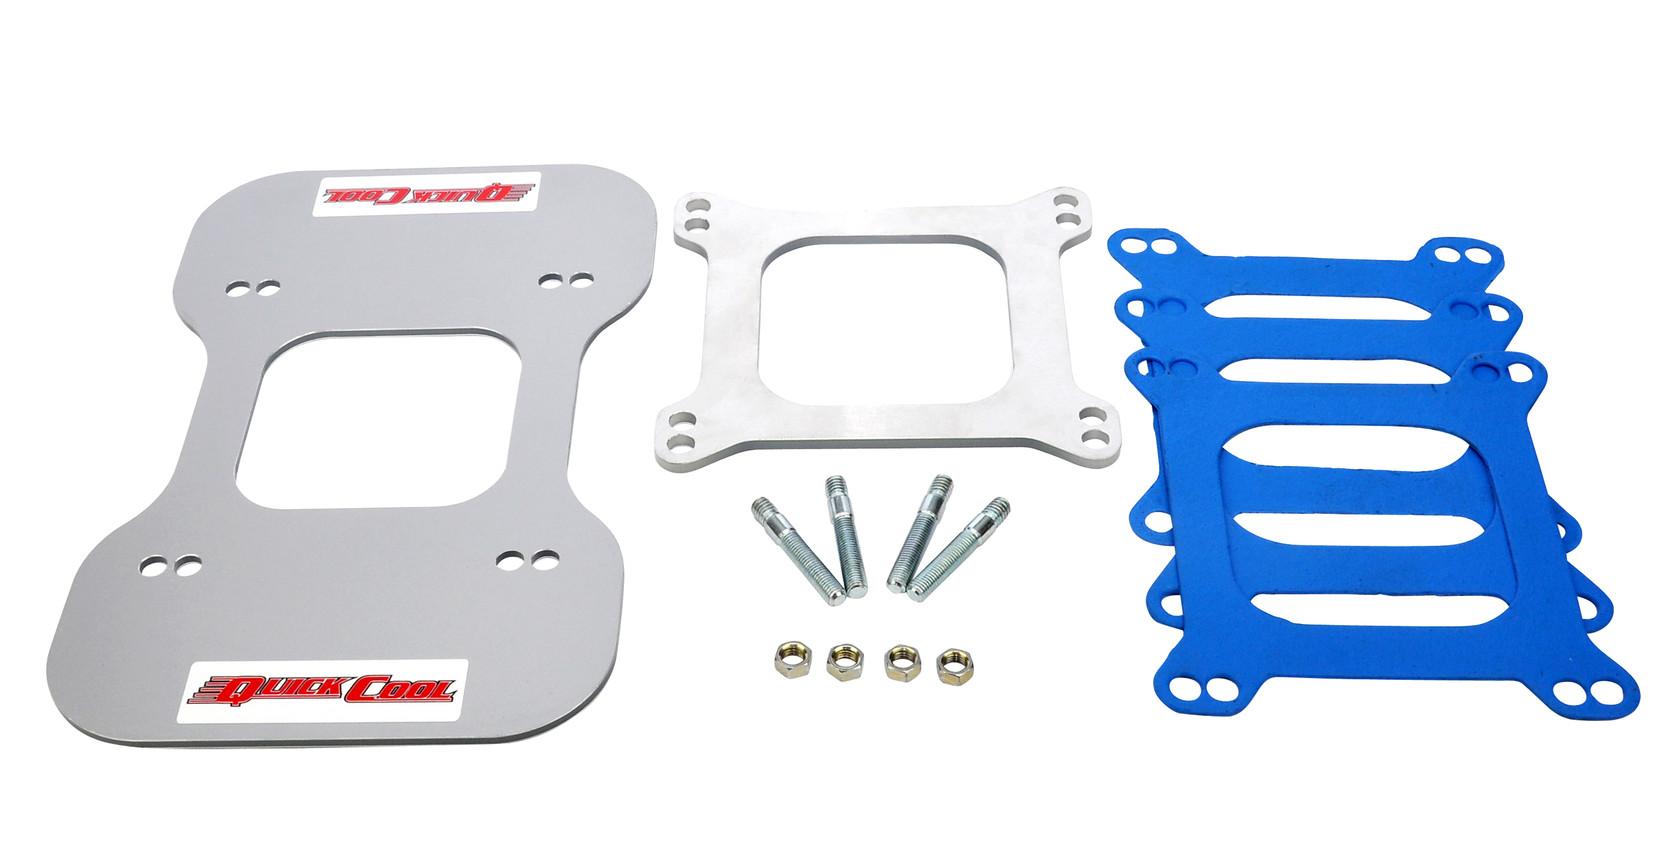 quick fuel 300-4013  Insulator Kit for 4150-style flange carburetors new